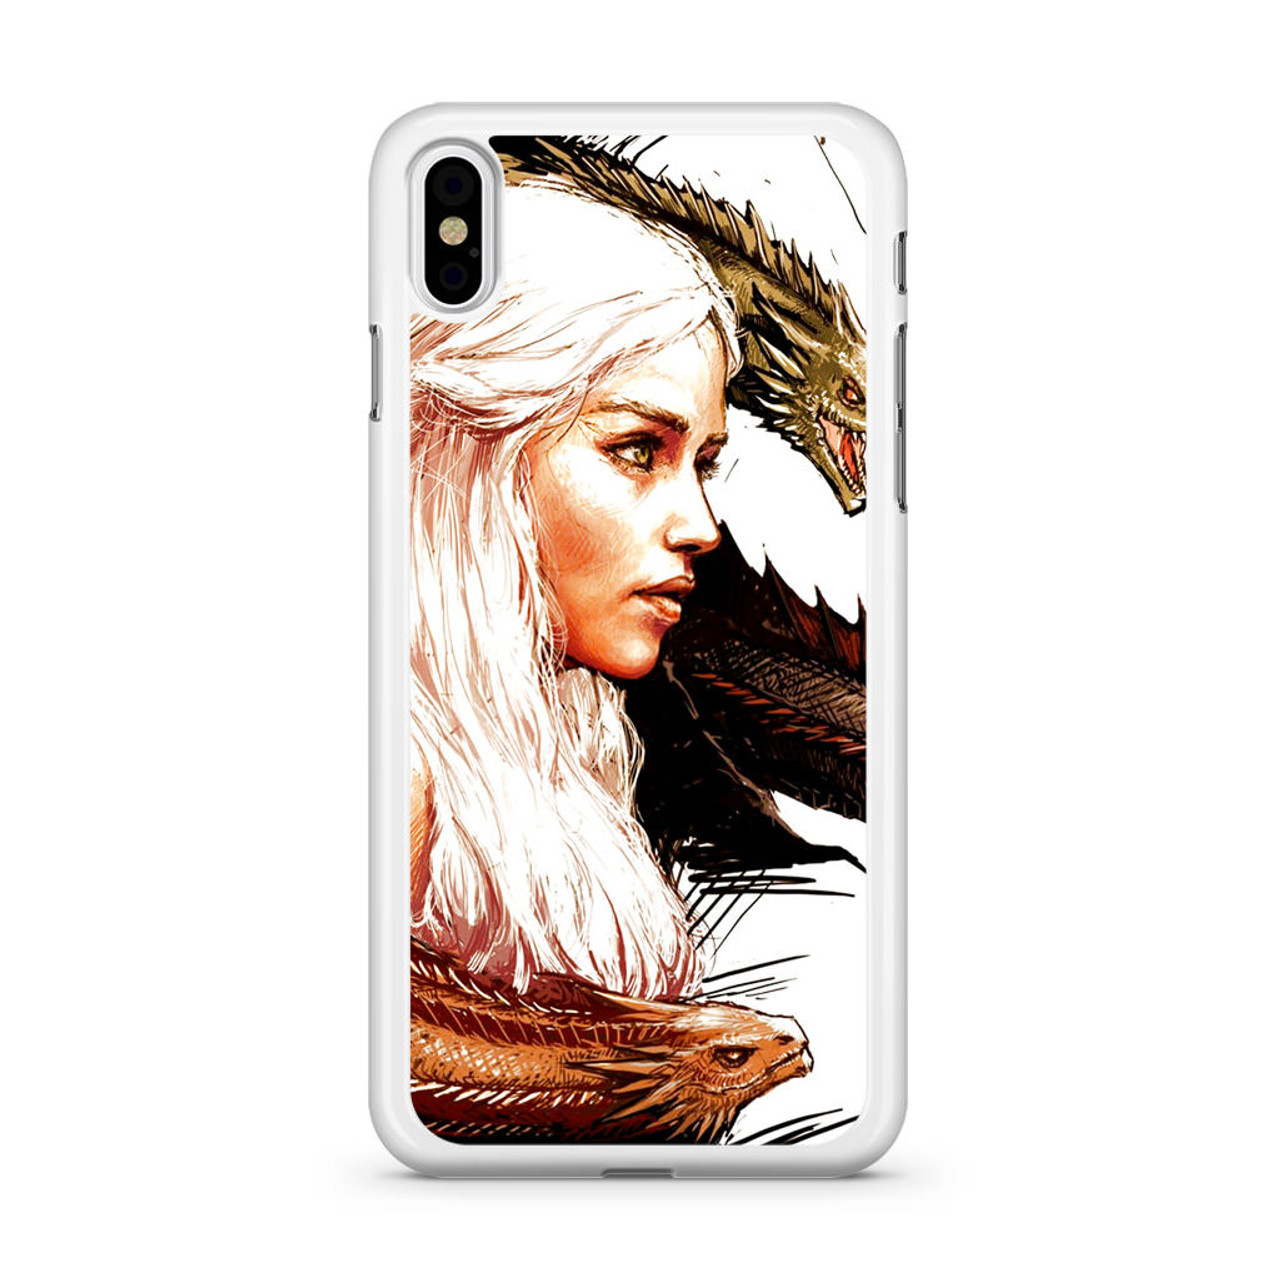 Game Of Thrones Daenerys Targaryen Art iphone case